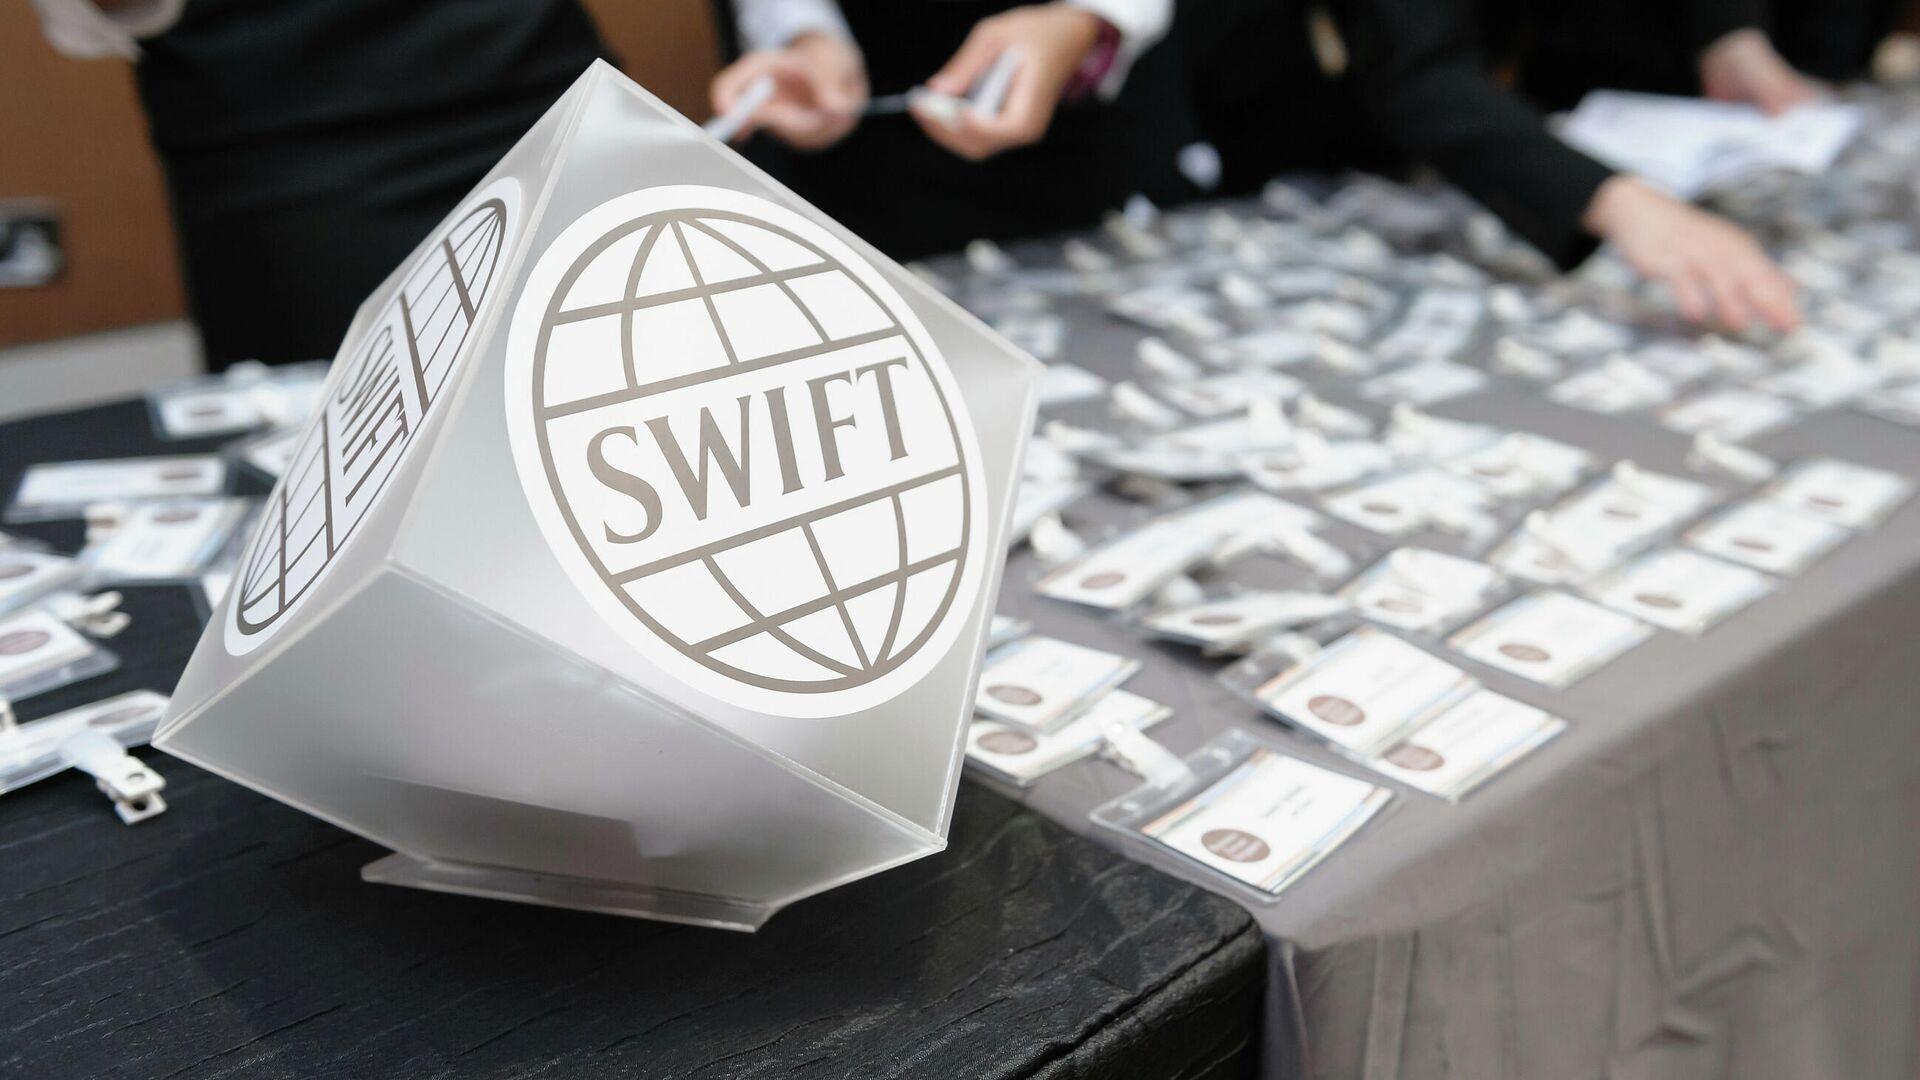 Логотип SWIFT - РИА Новости, 1920, 05.04.2021